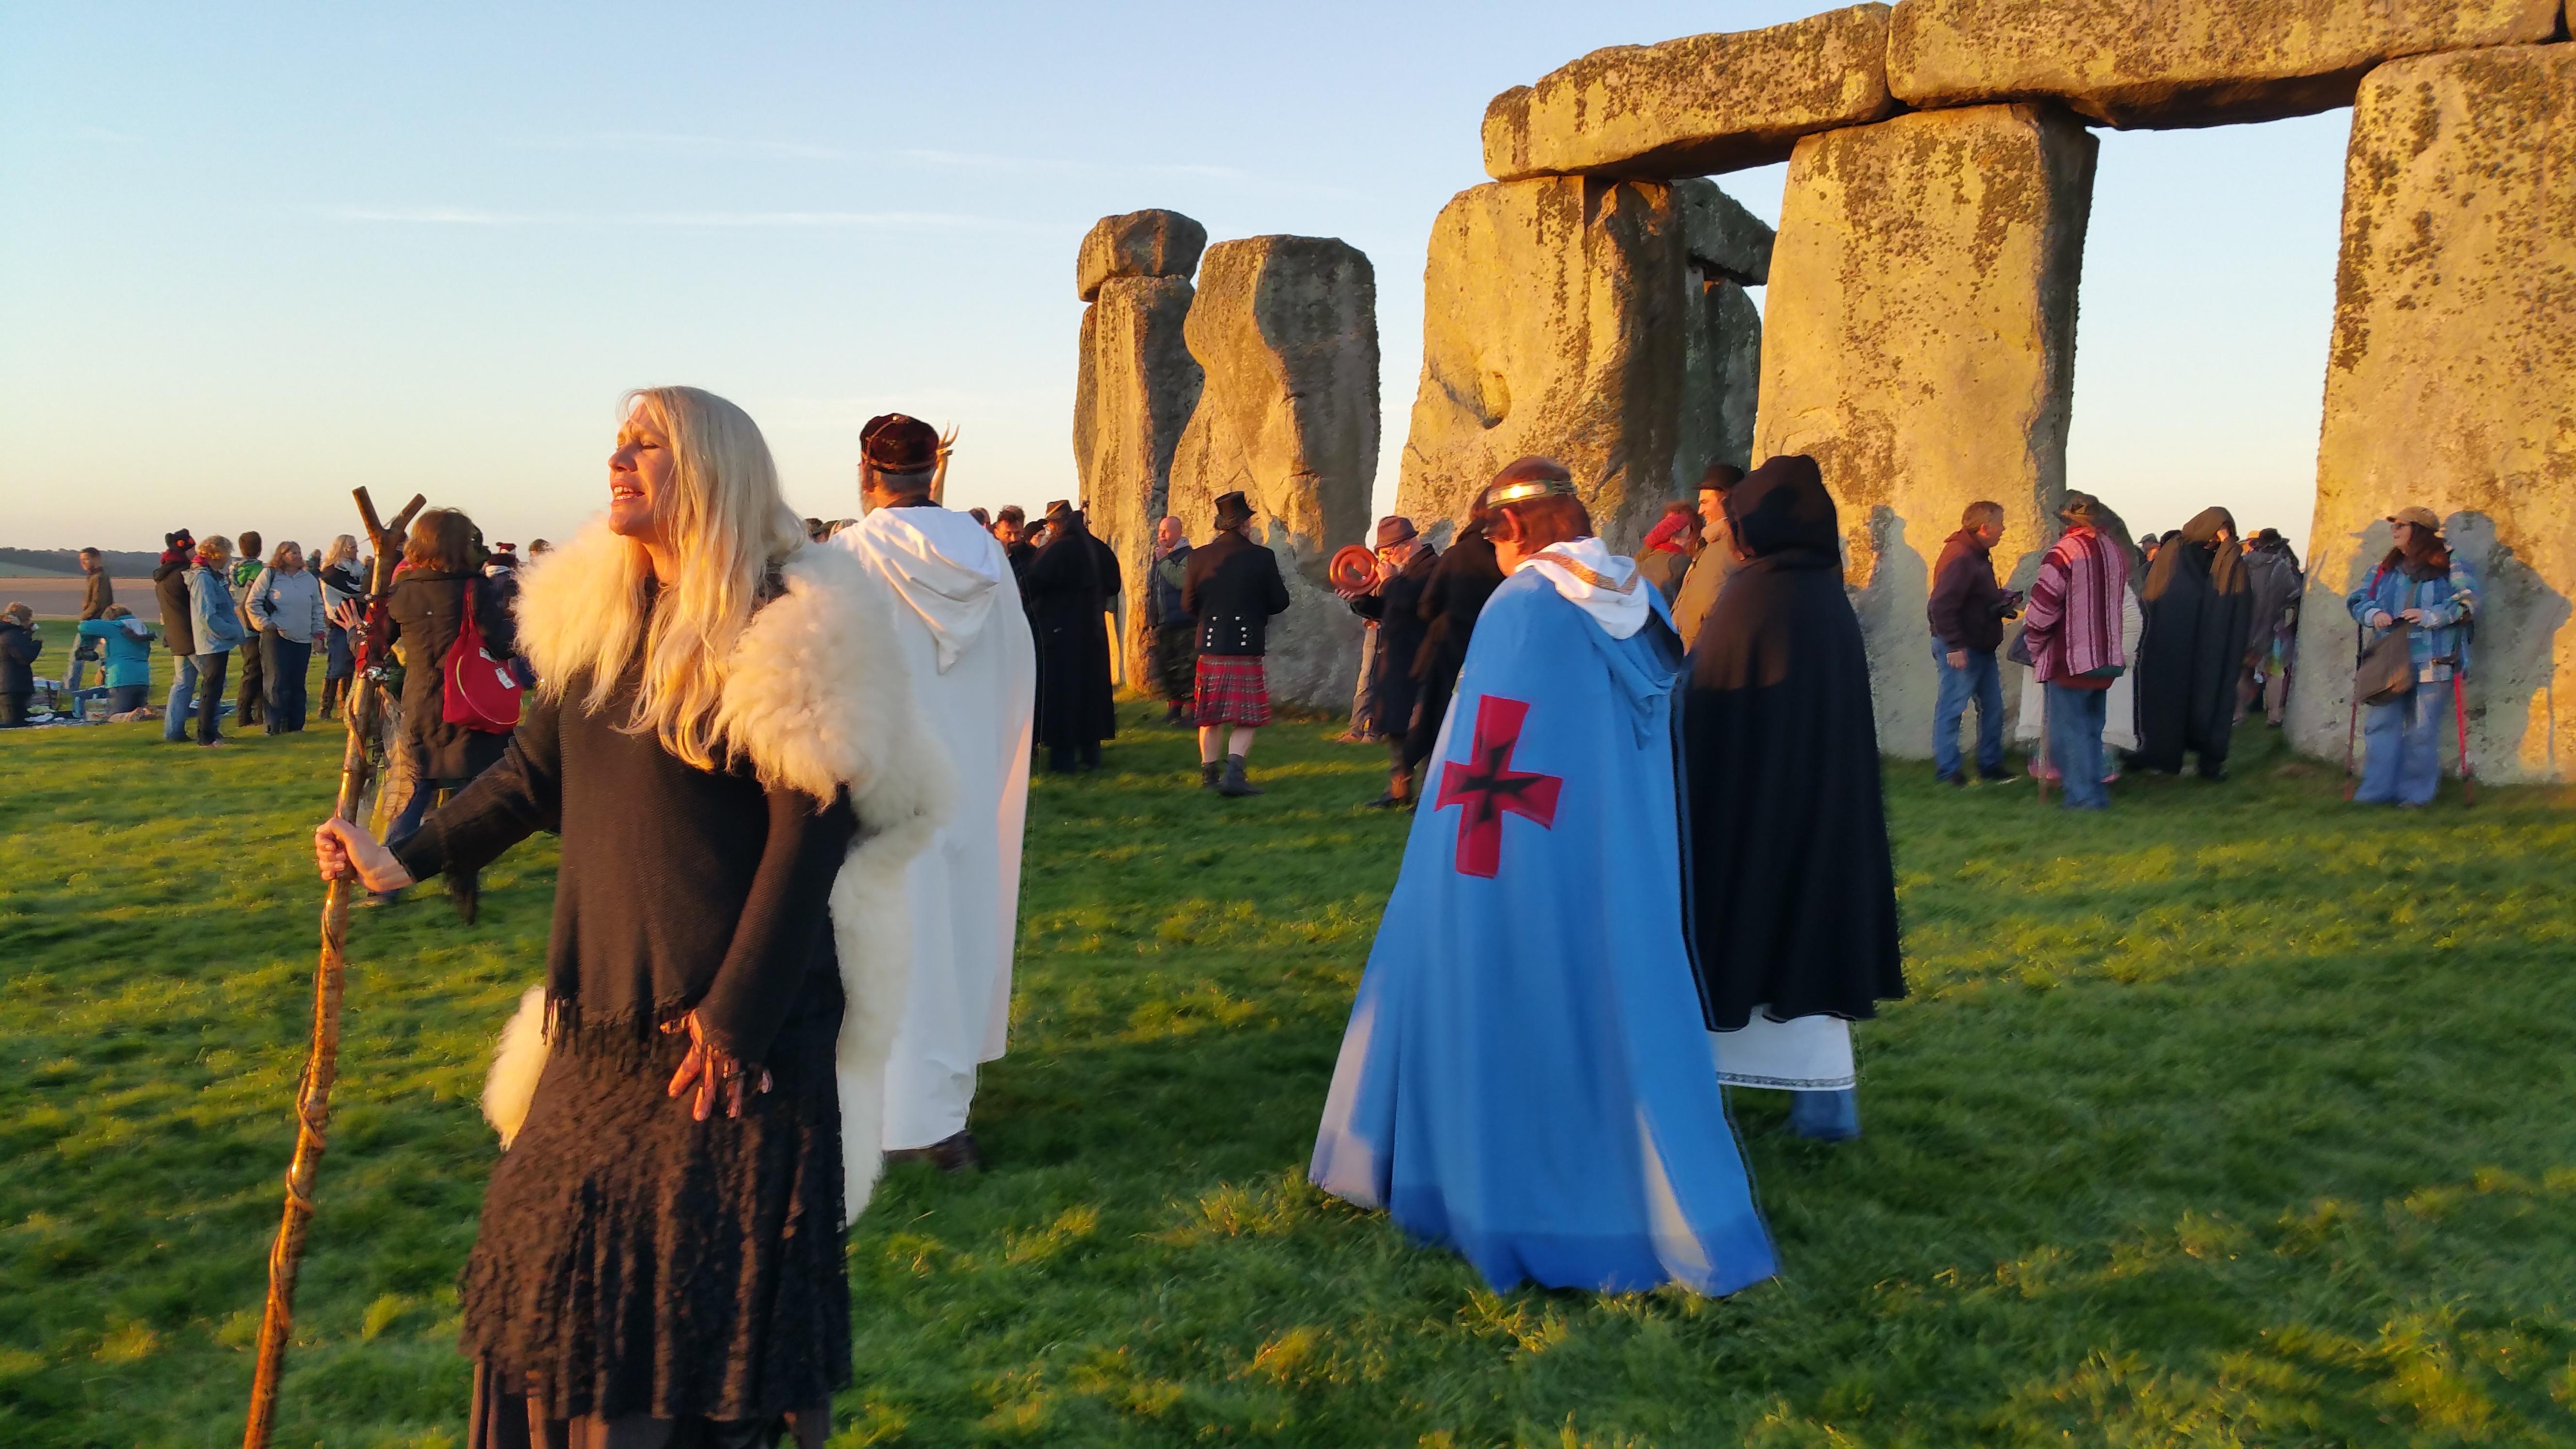 Druids and Pagans enjoying the Equinox sunrise celebrations at Stonehenge.